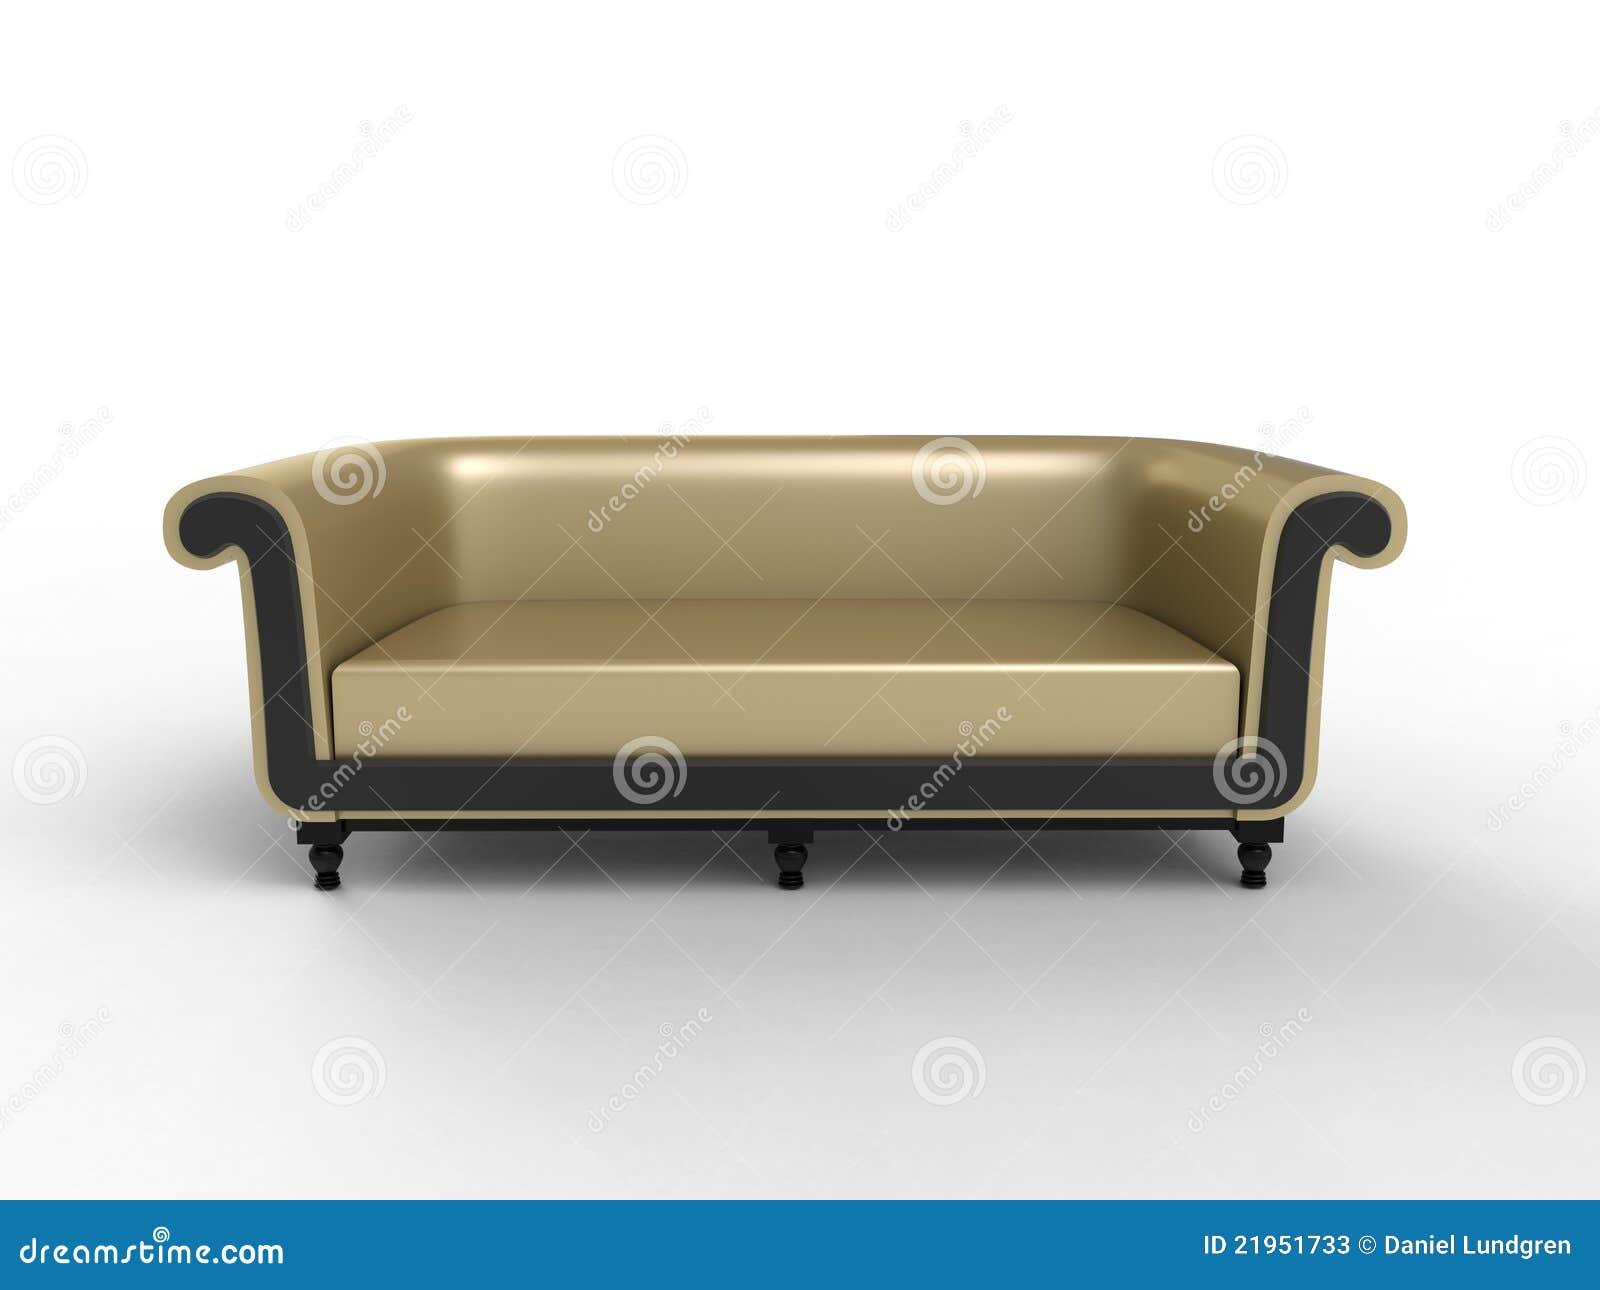 persian sofa stock photos image 21951733. Black Bedroom Furniture Sets. Home Design Ideas